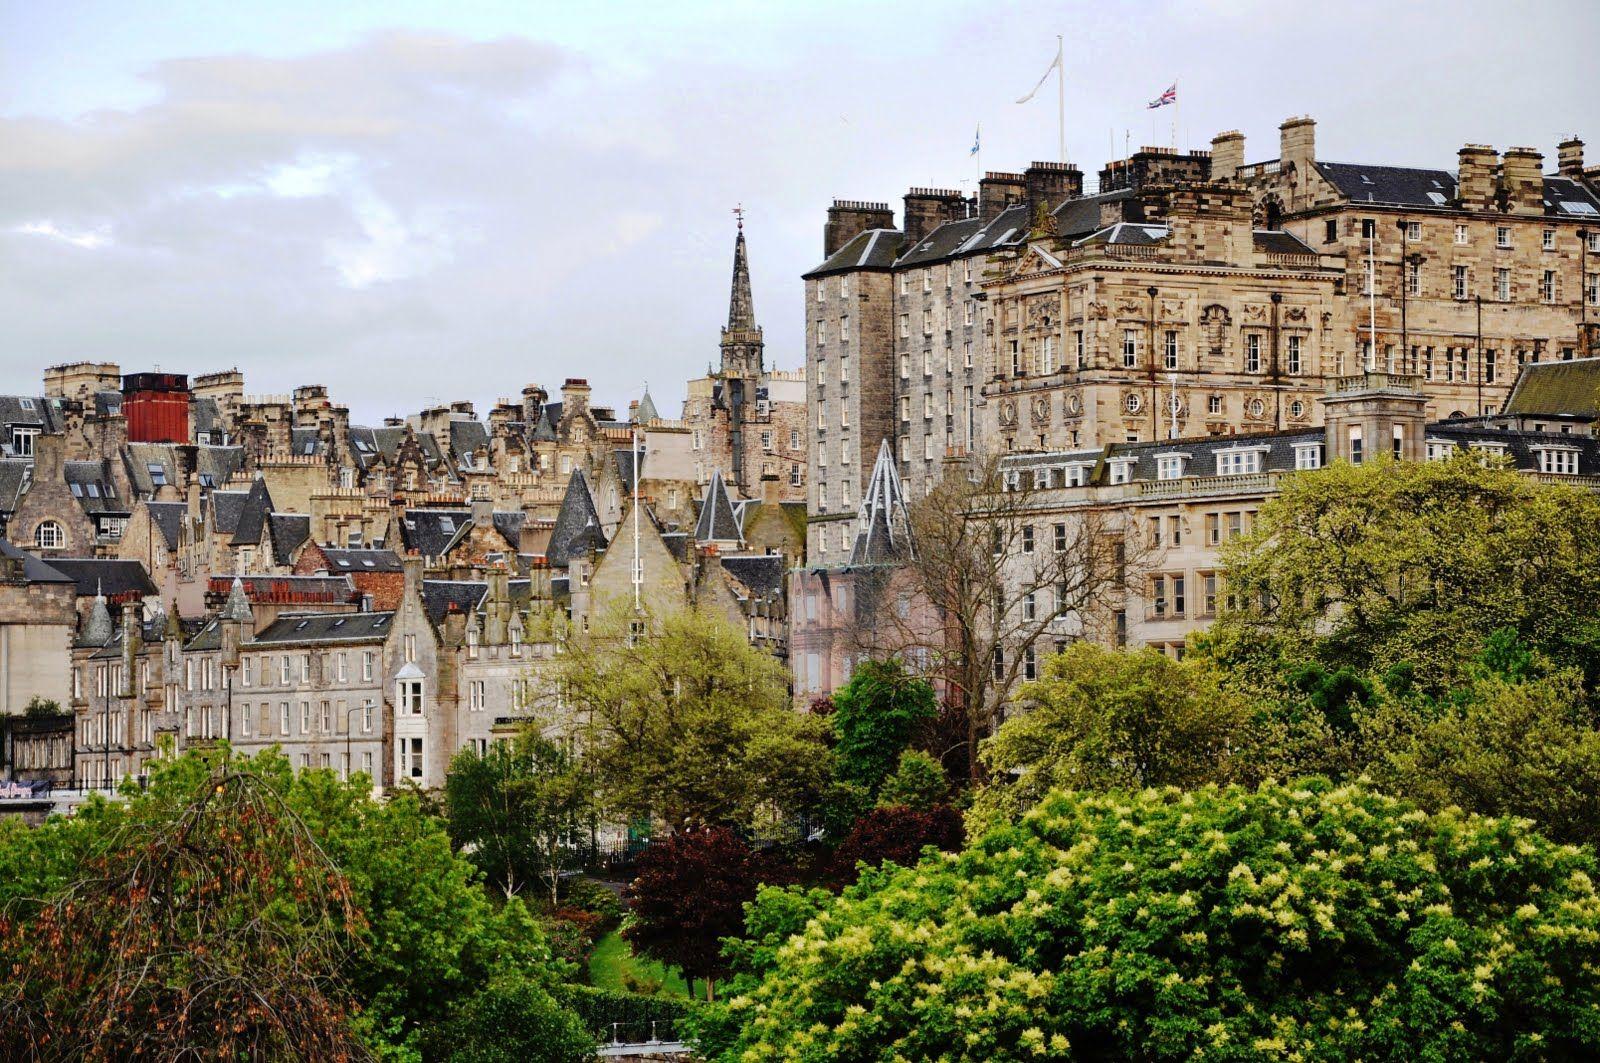 Edinburgh is the City of Enlightenment - Scotland